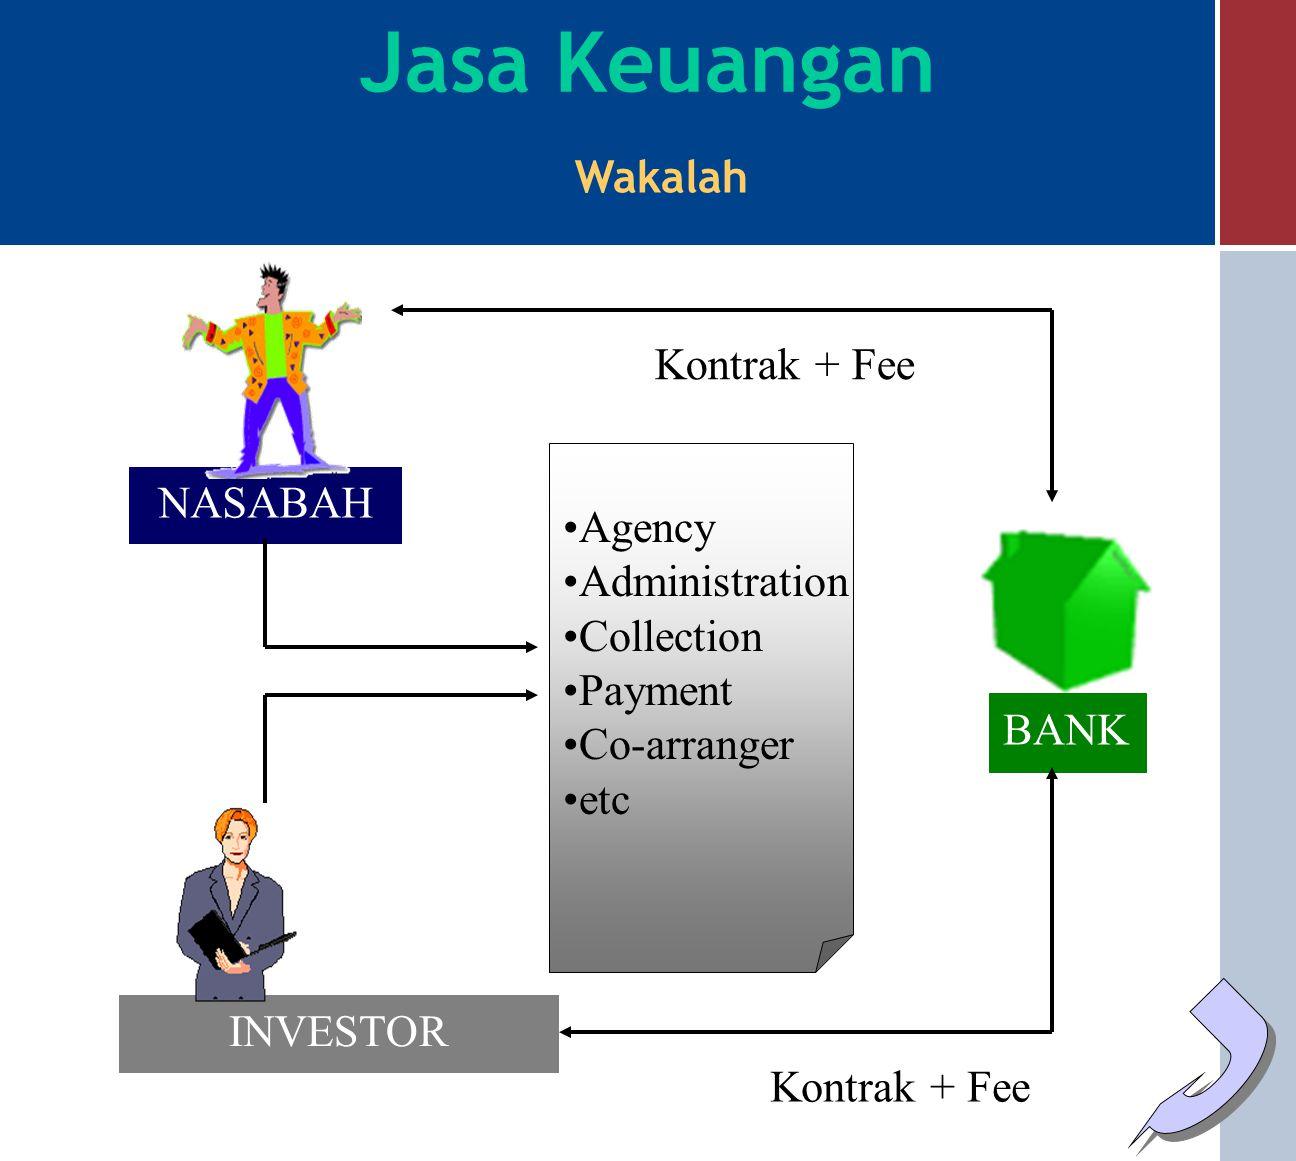 Jasa Keuangan Wakalah Kontrak + Fee NASABAH Agency Administration